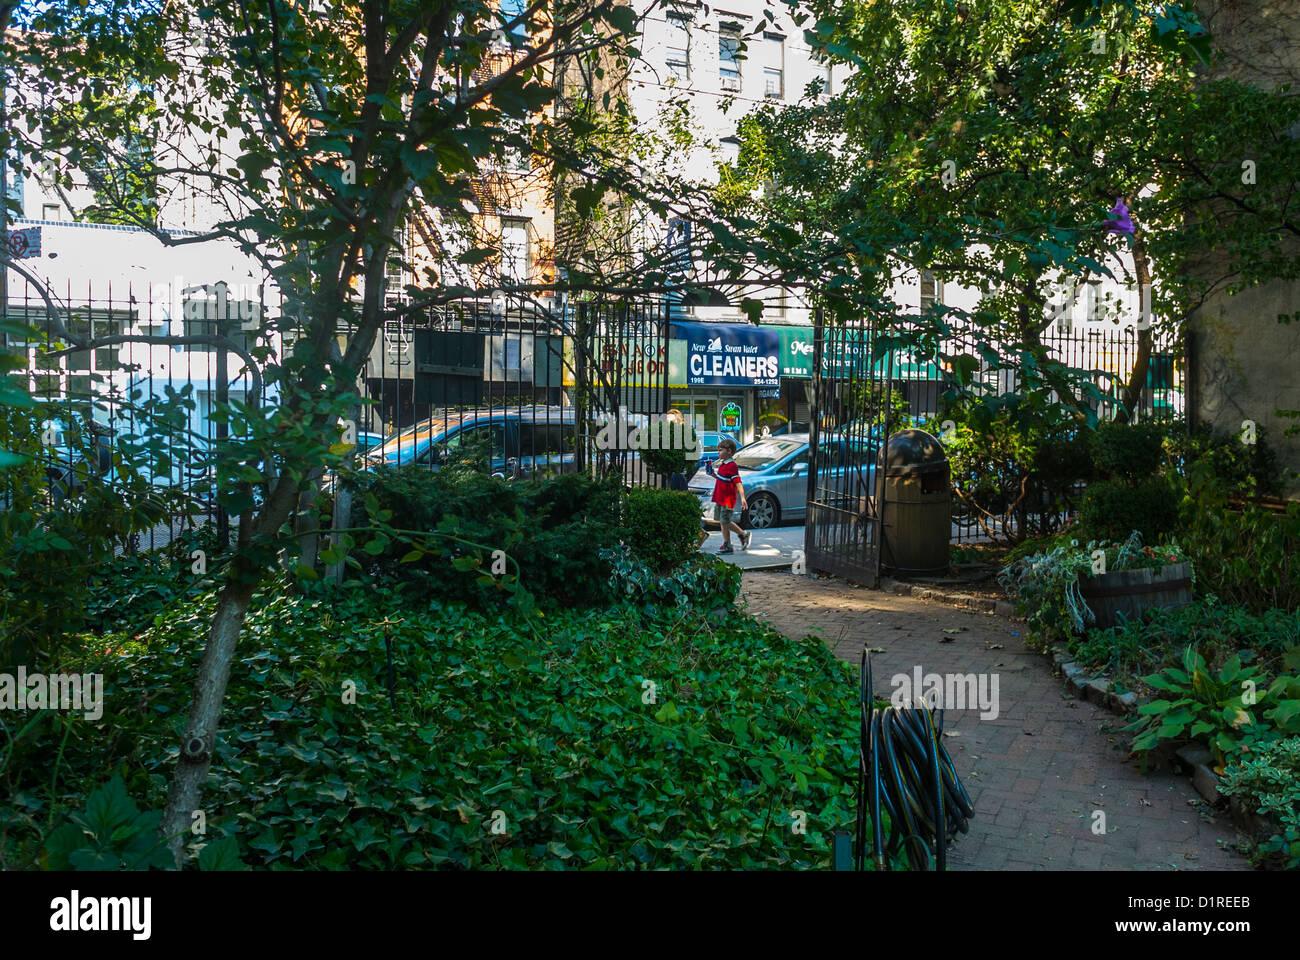 New York East Village Miracle Garden Community Gardens Scenes Stock Photo Royalty Free